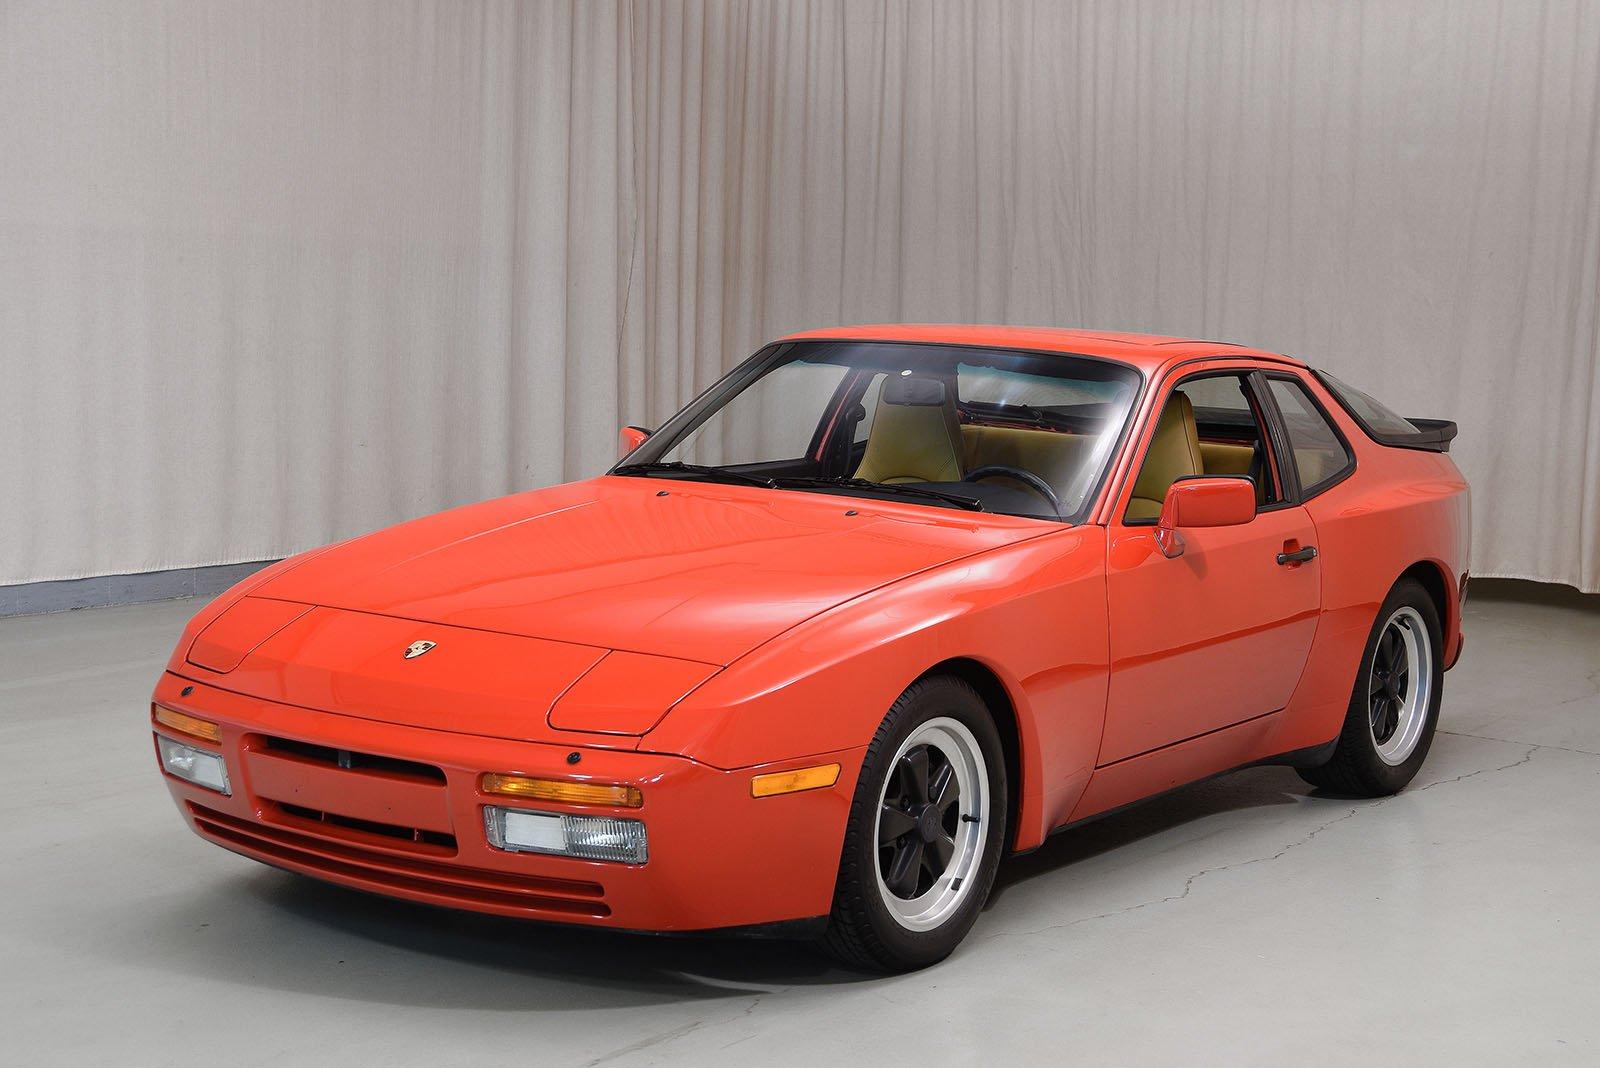 1986 porsche 944 turbo. Black Bedroom Furniture Sets. Home Design Ideas